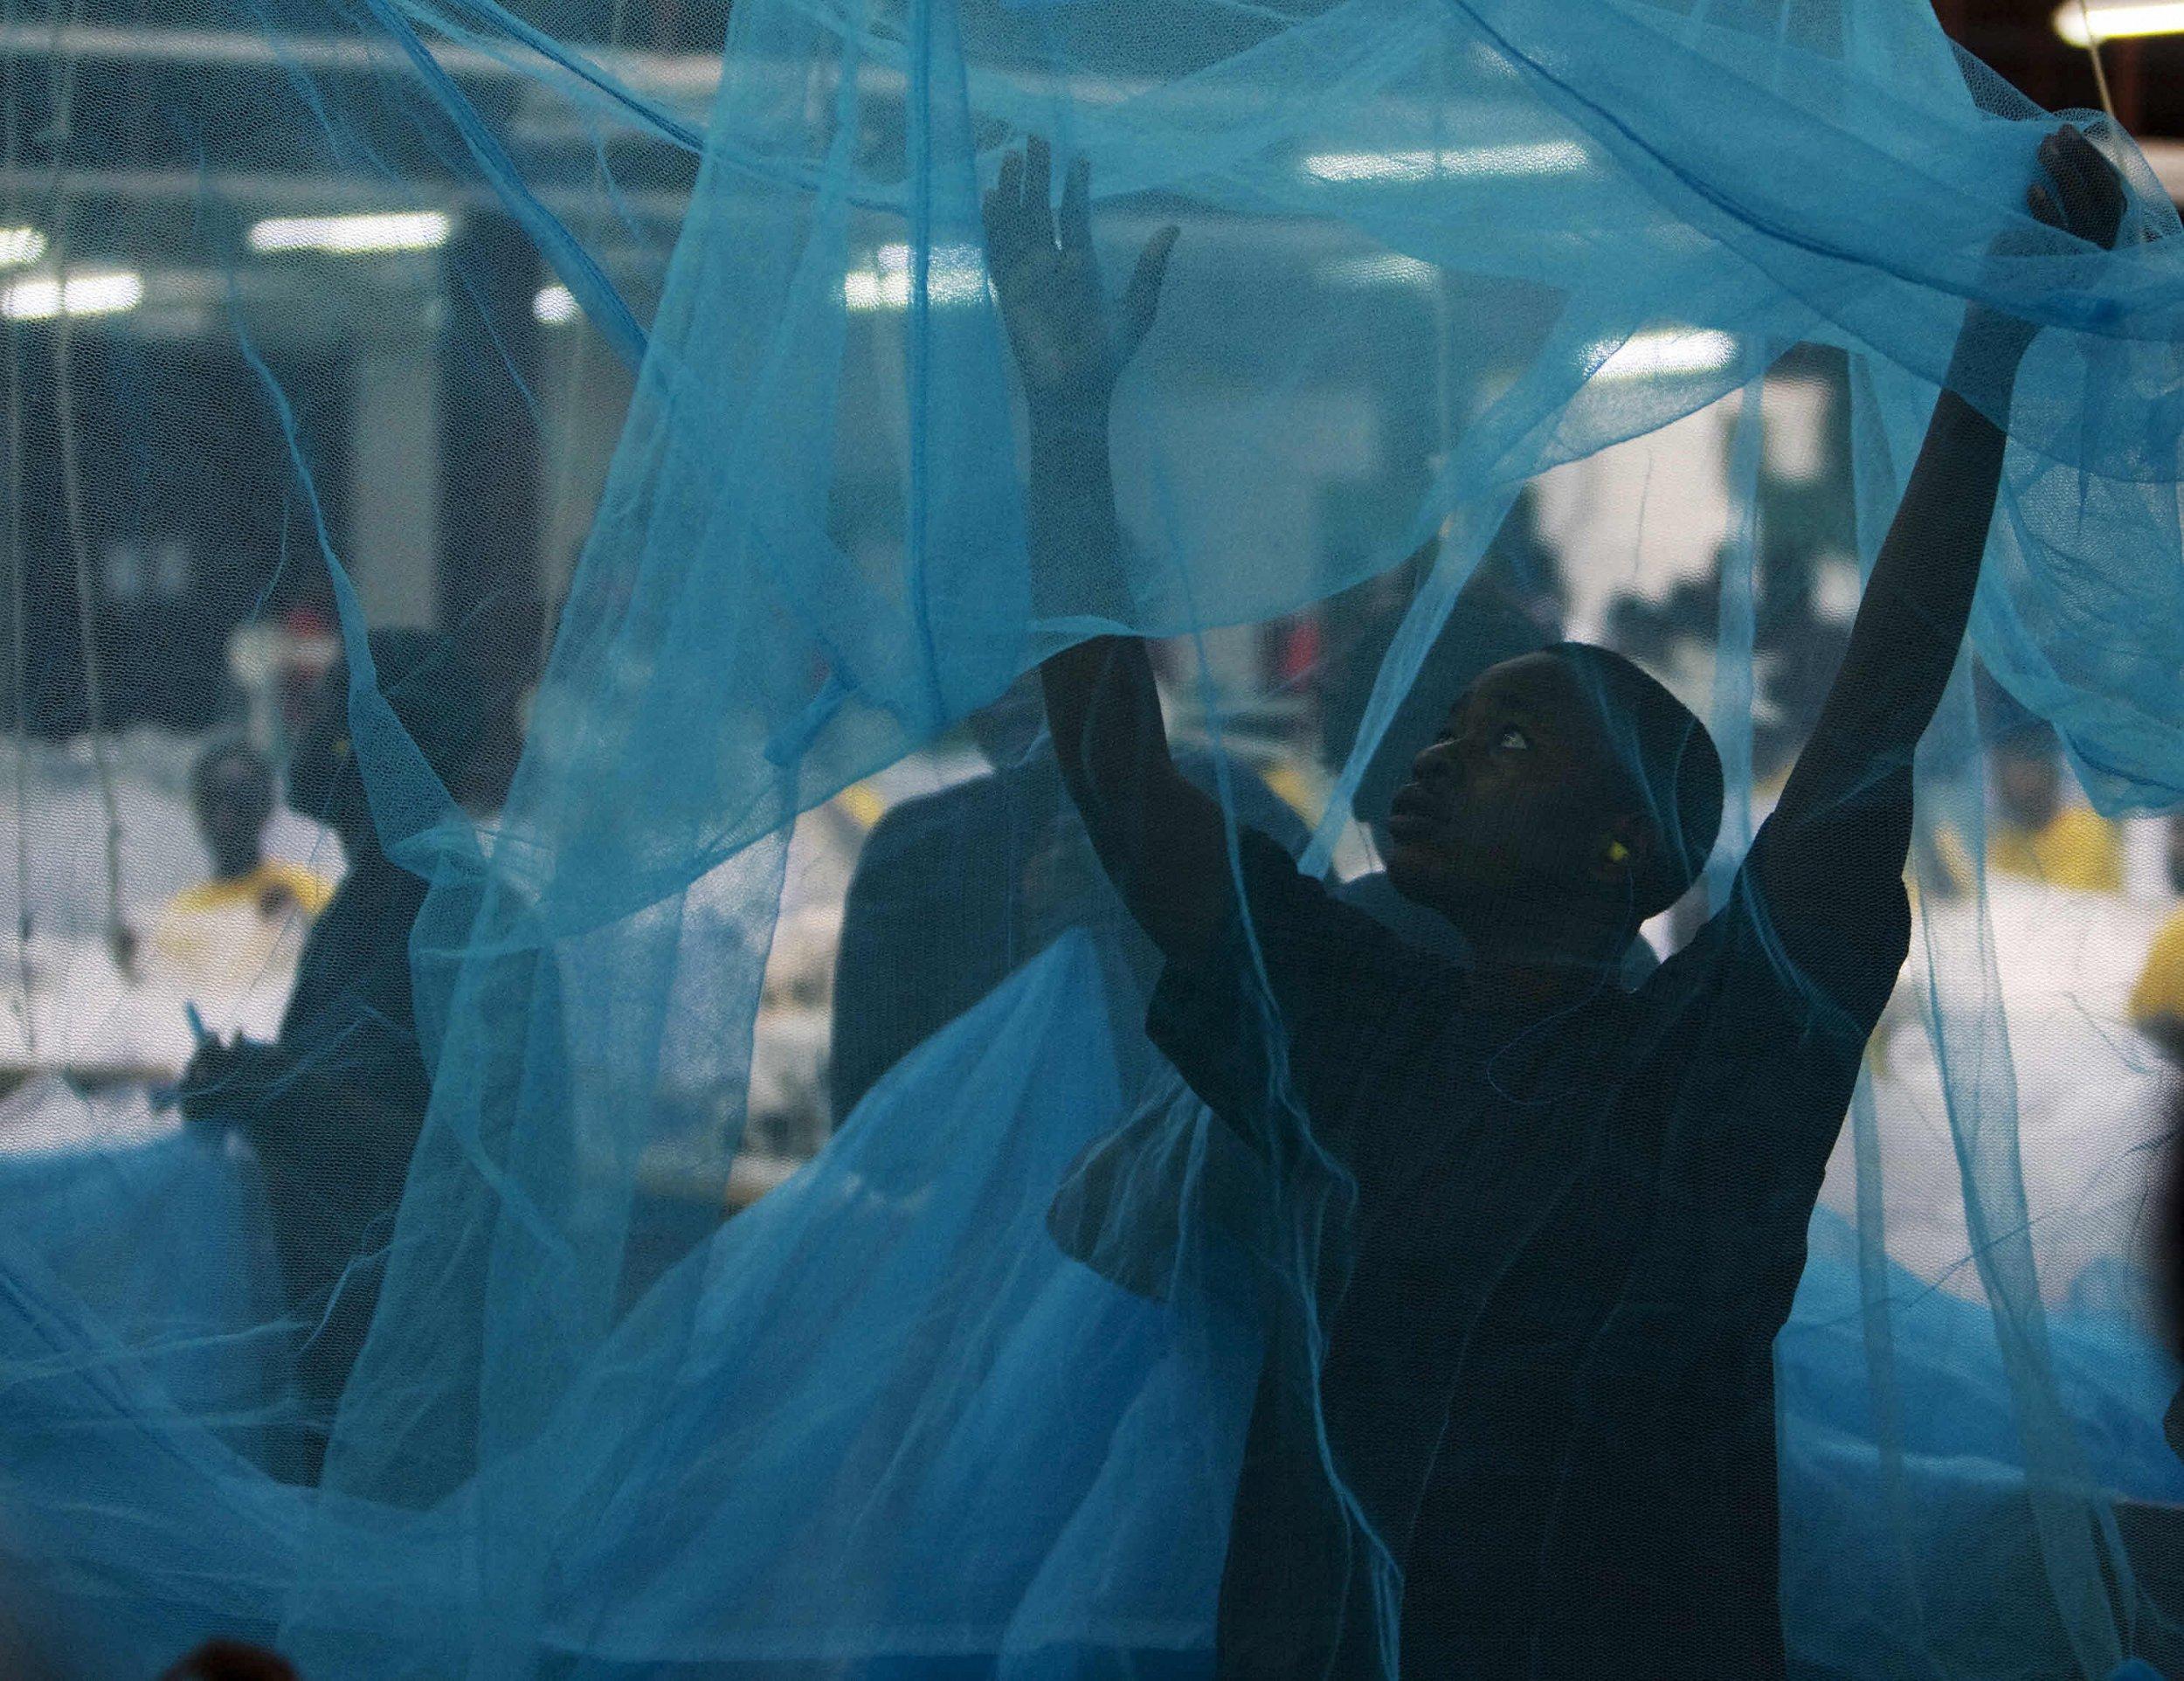 Malaria mosquito net